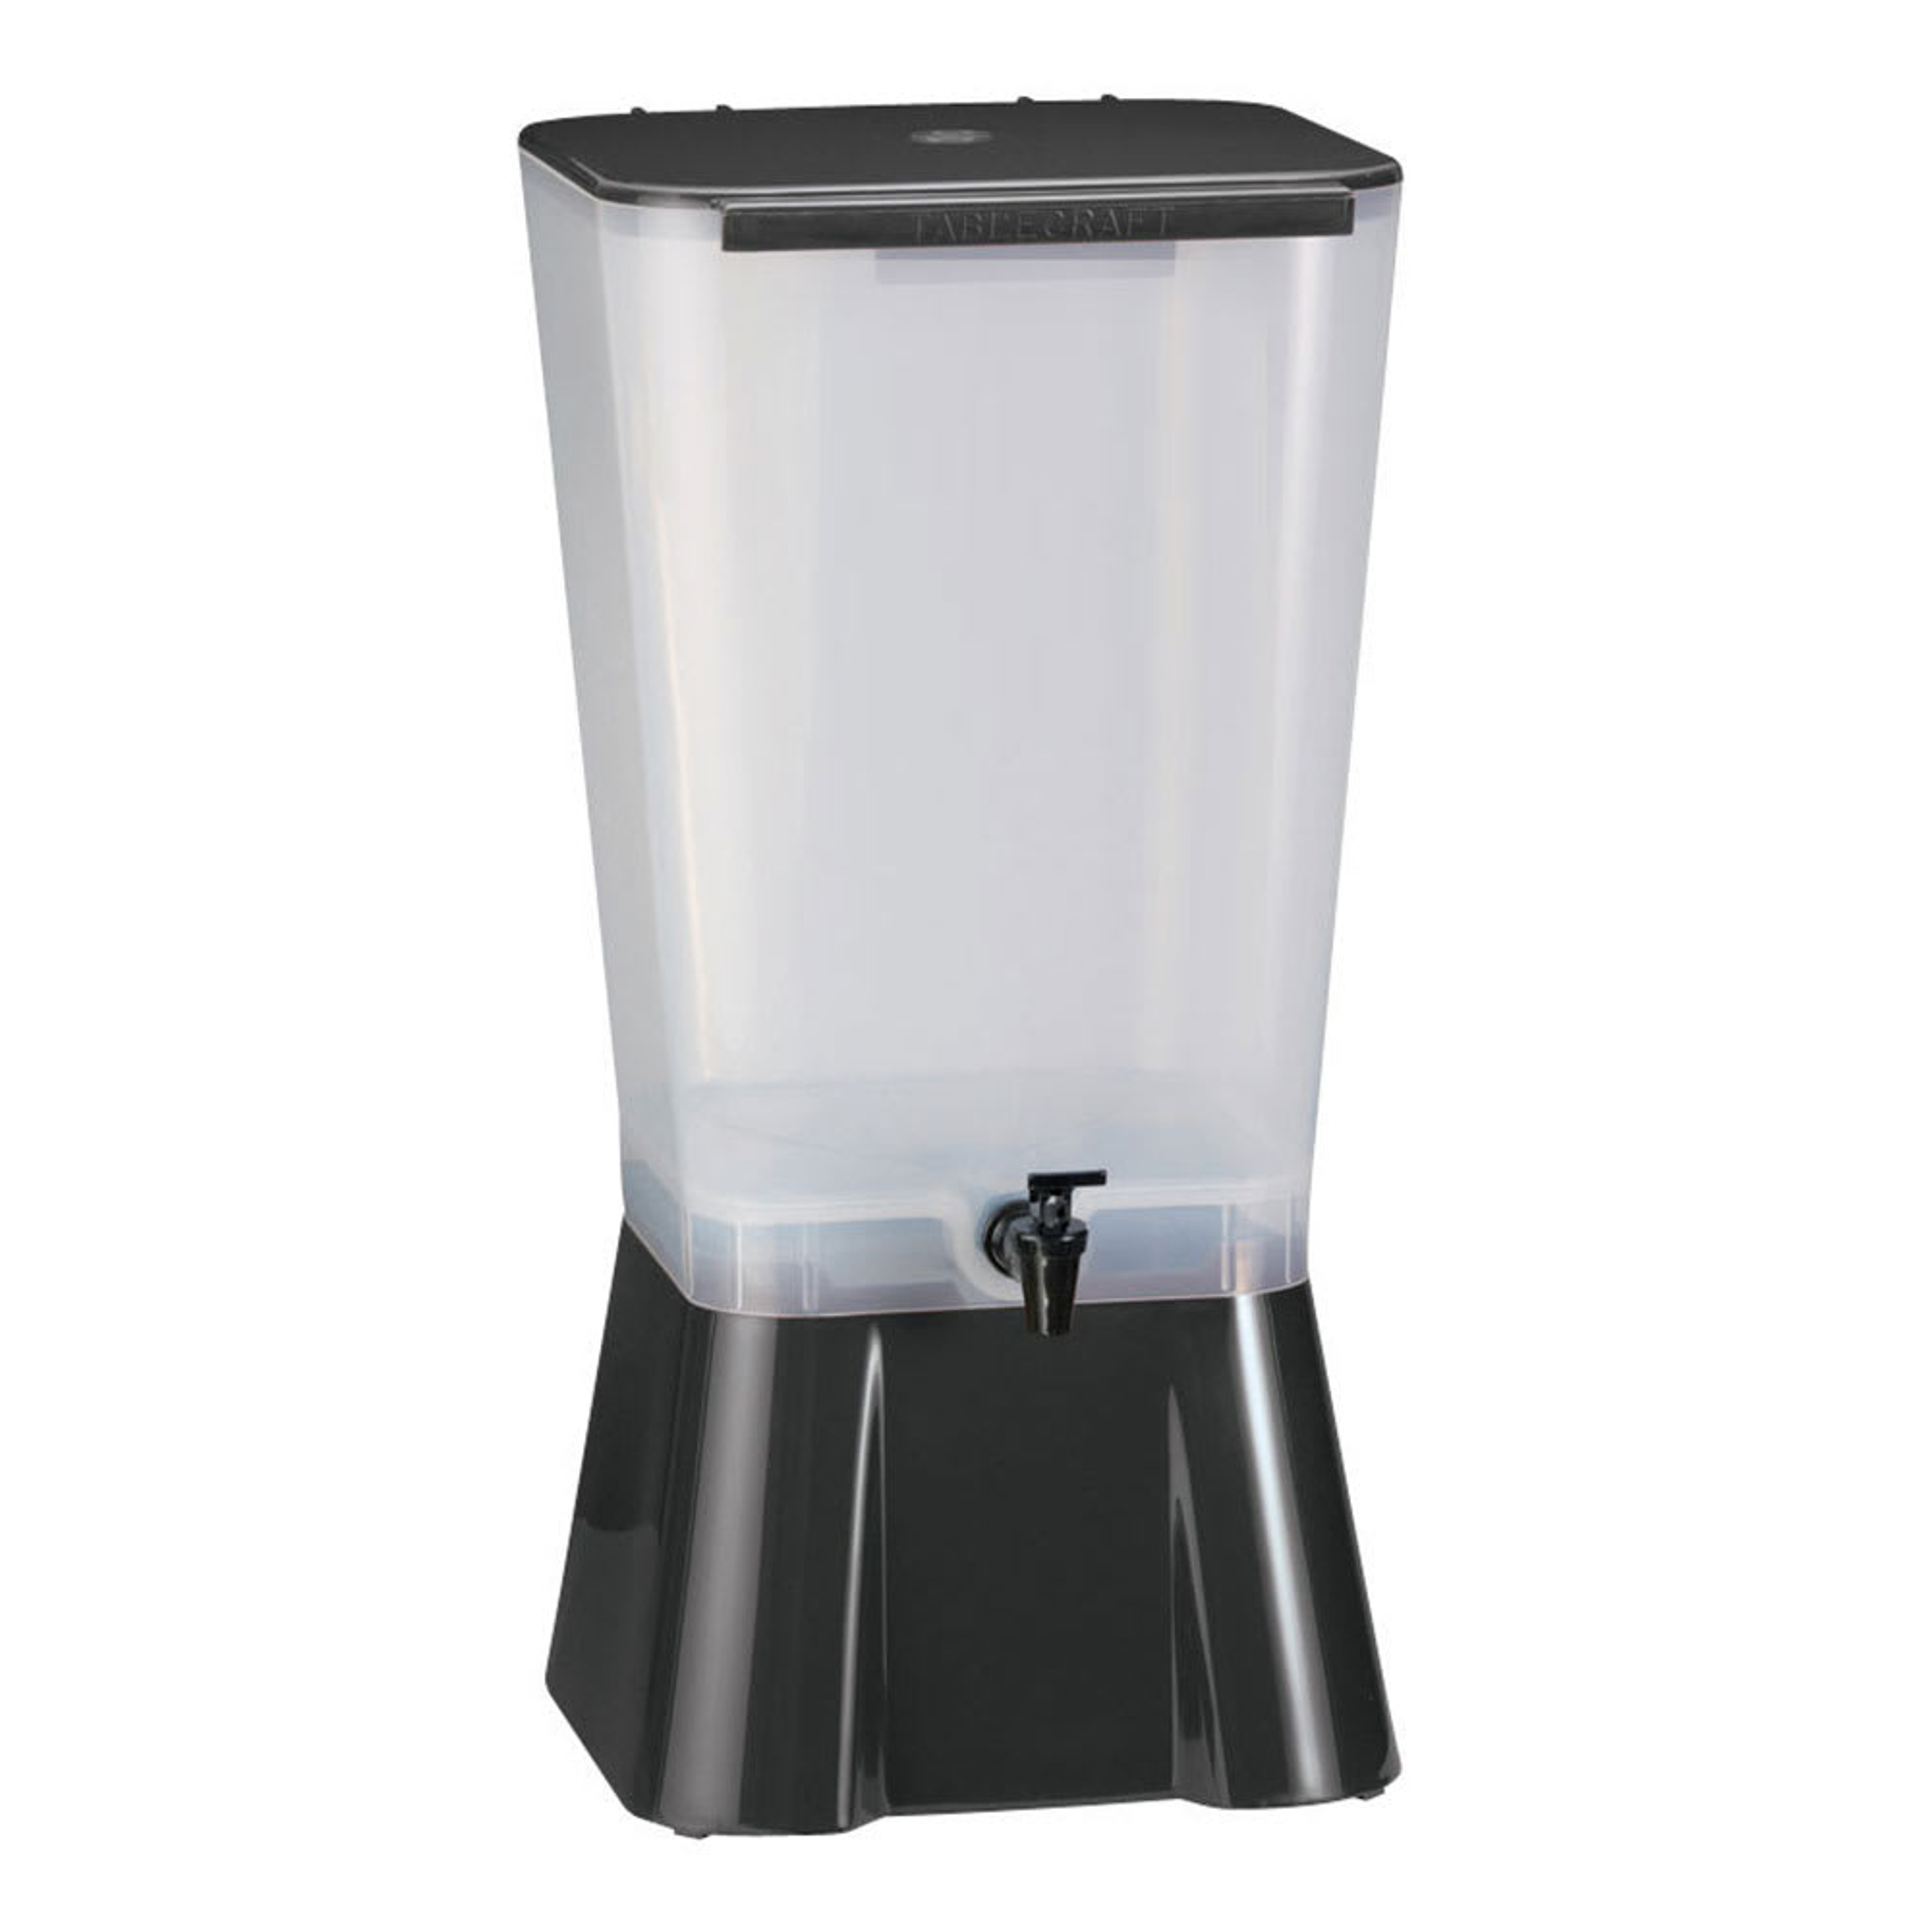 Tablecraft 1053 5 Gallon Beverage Dispenser, Polypropylene, Black